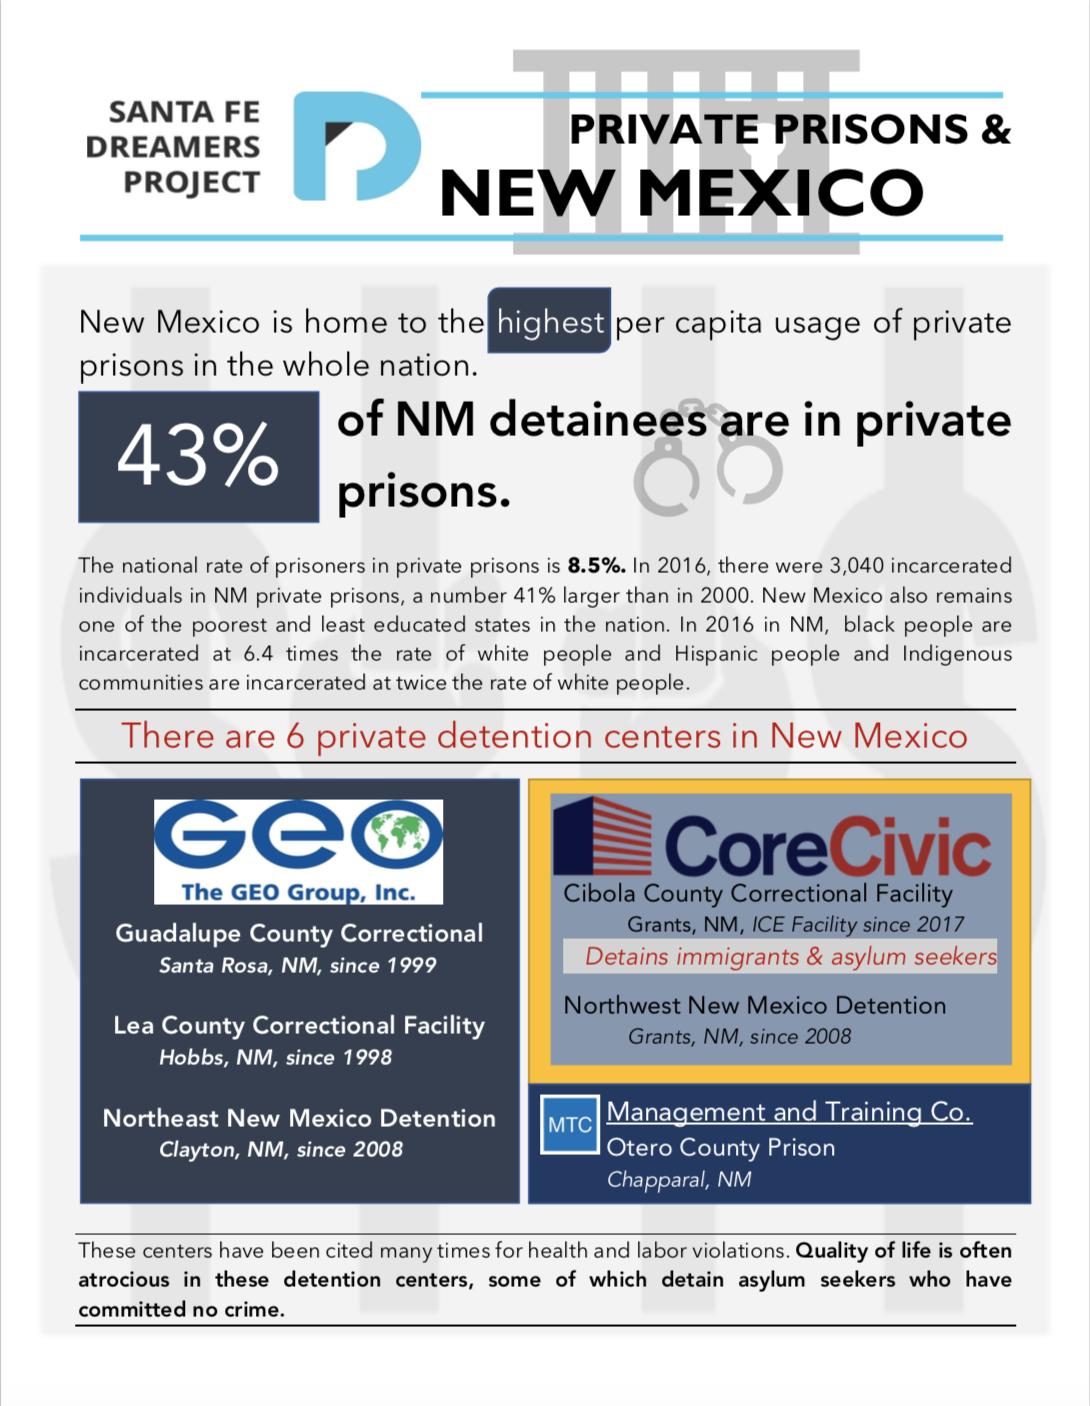 Private Prisons in New Mexico